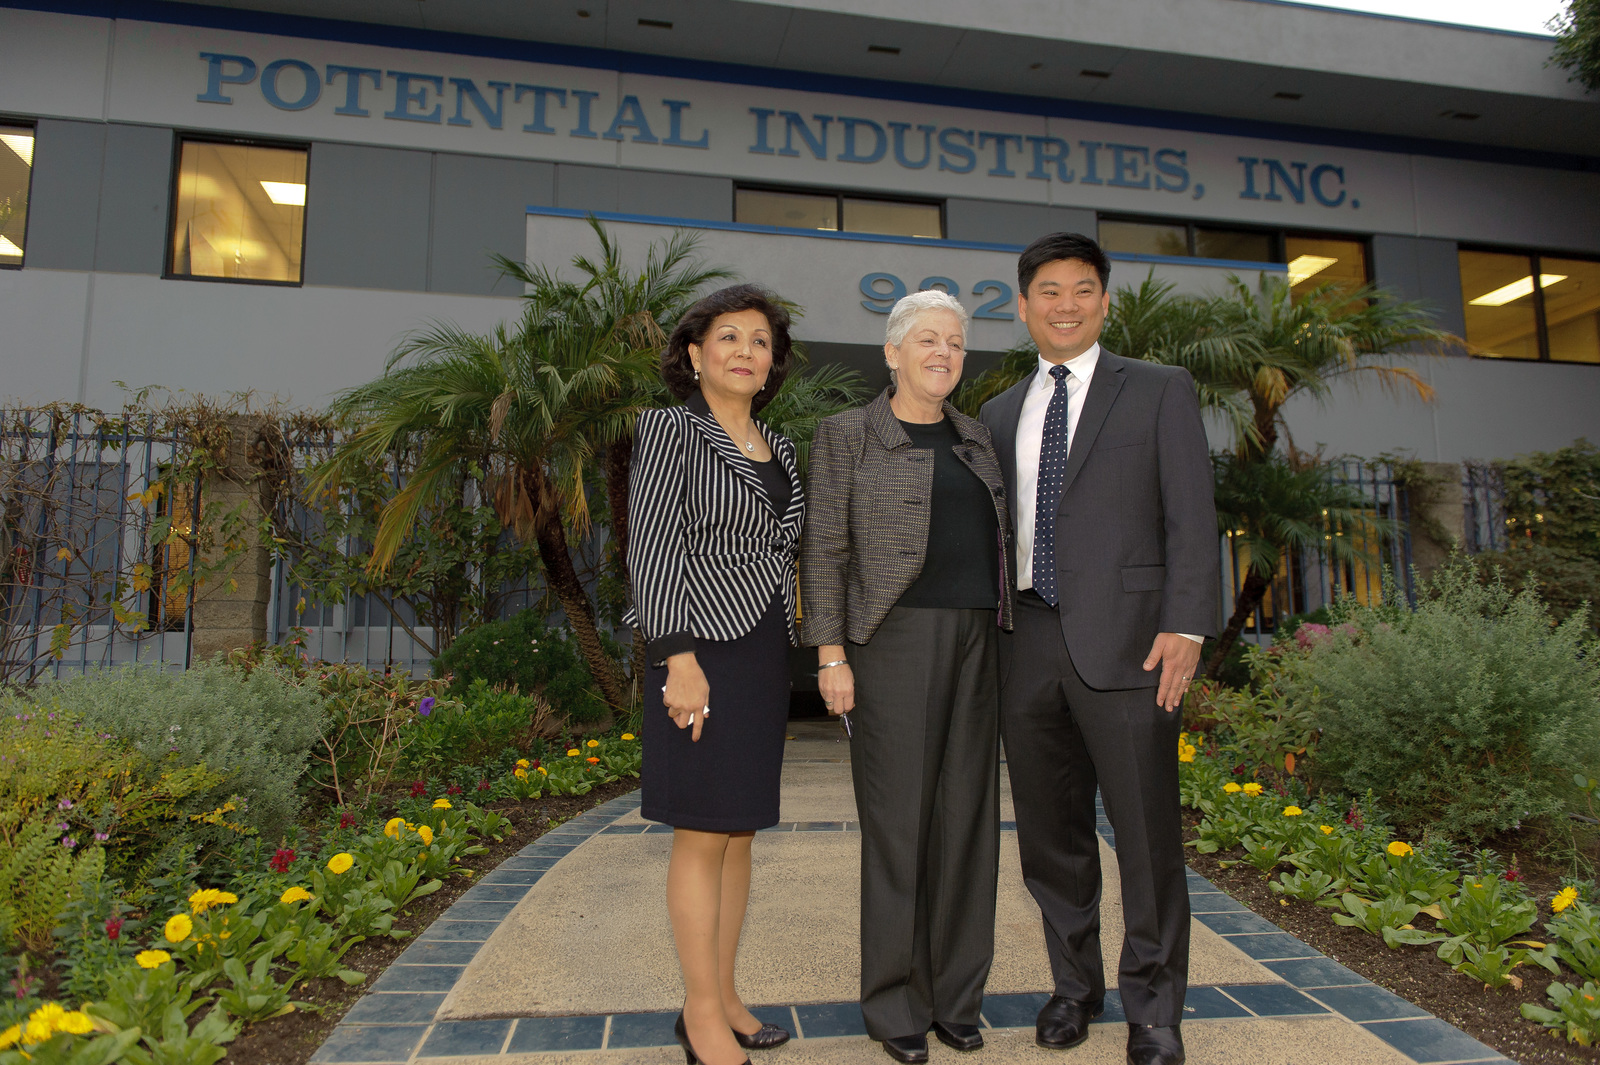 Office of the Administrator - Los Angeles, California [412-APD-1168-2013-11-21_LA_125.jpg]